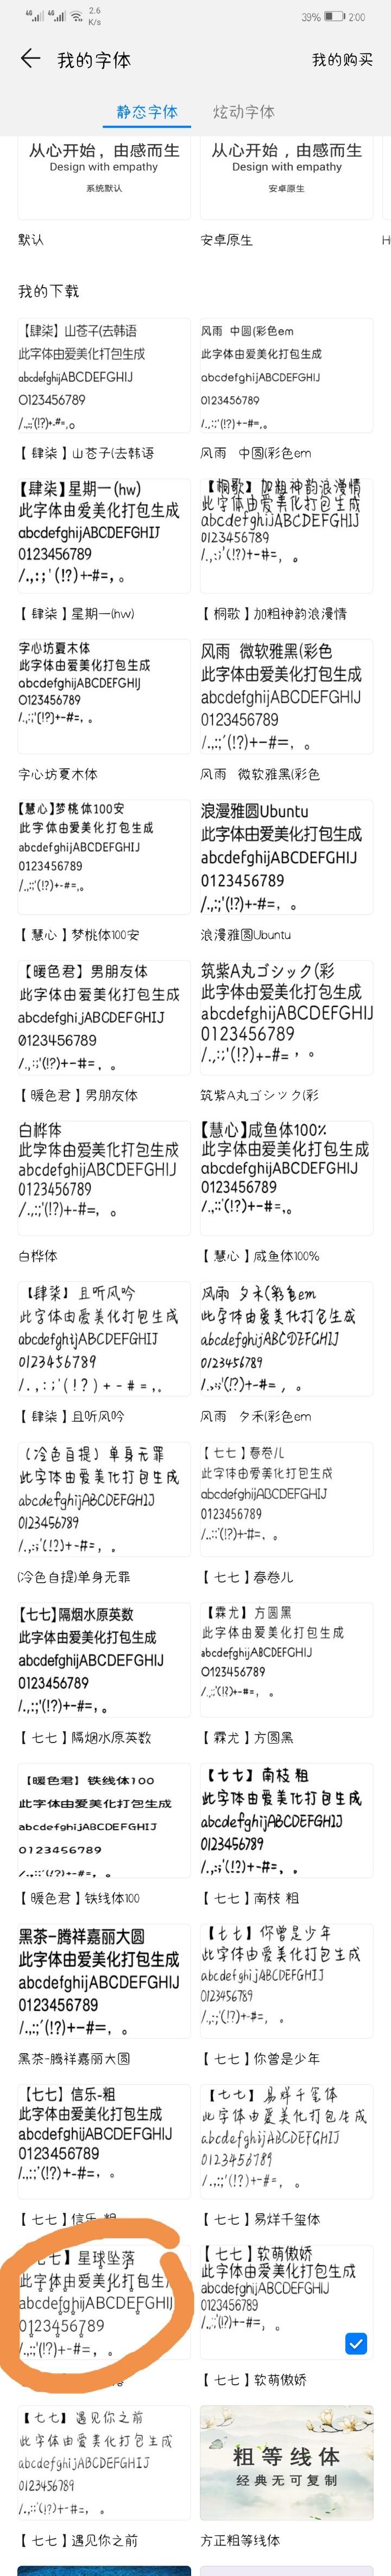 %2Fstorage%2Femulated%2F0%2FPictures%2FScreenshots%2FScreenshot_20190220_140043.jpg